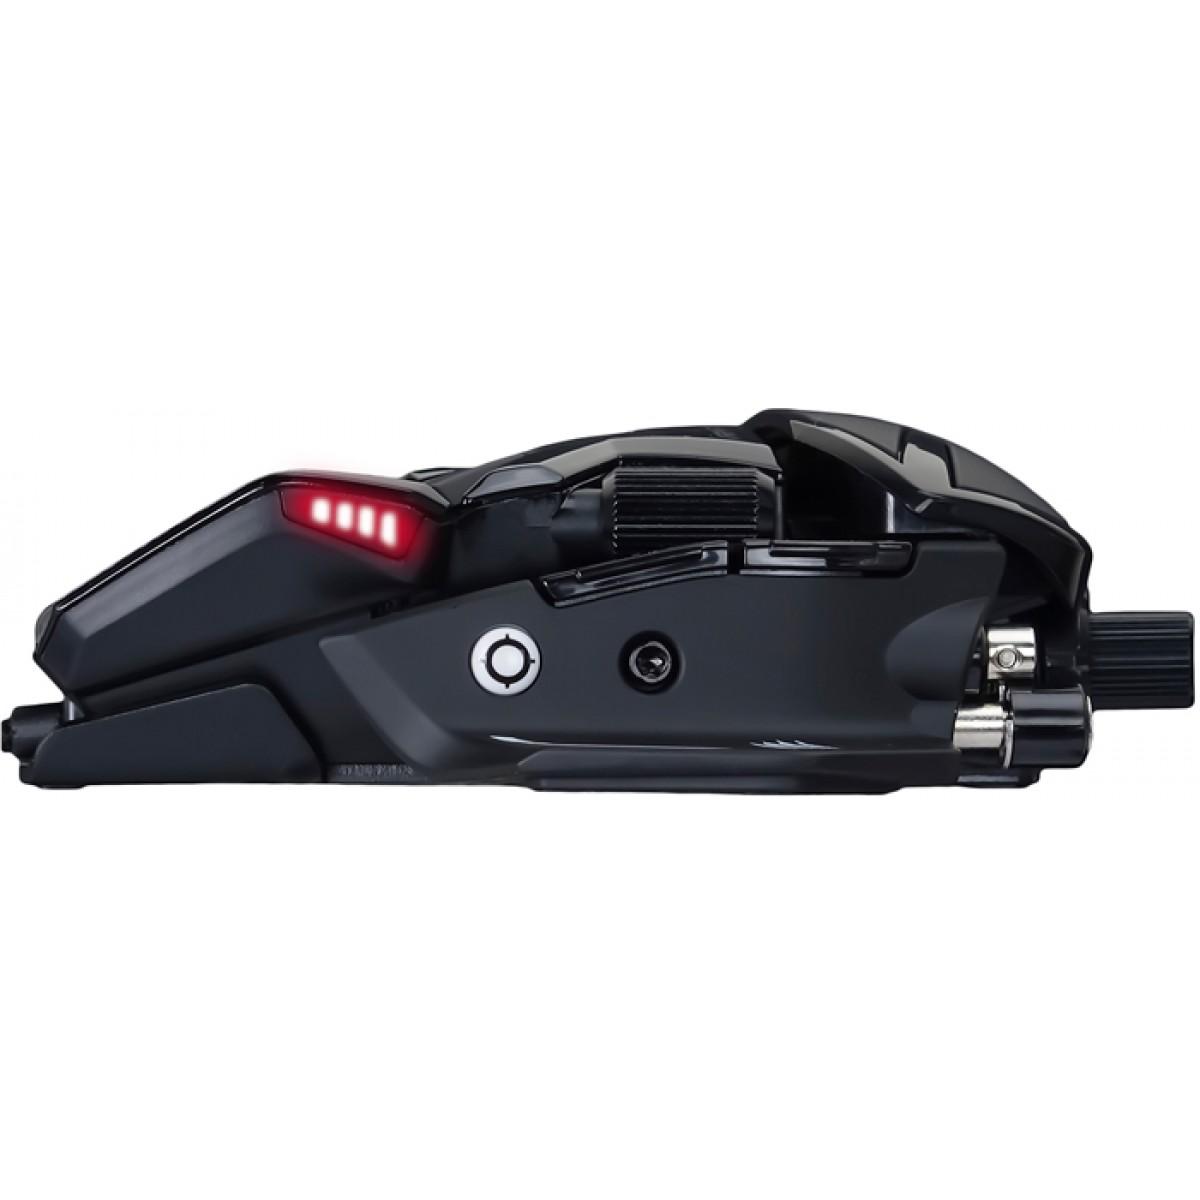 Mouse Gamer Mad Catz RAT 8+, 16000 DPI, 11 Botões, Black, MR05DCAMBL00